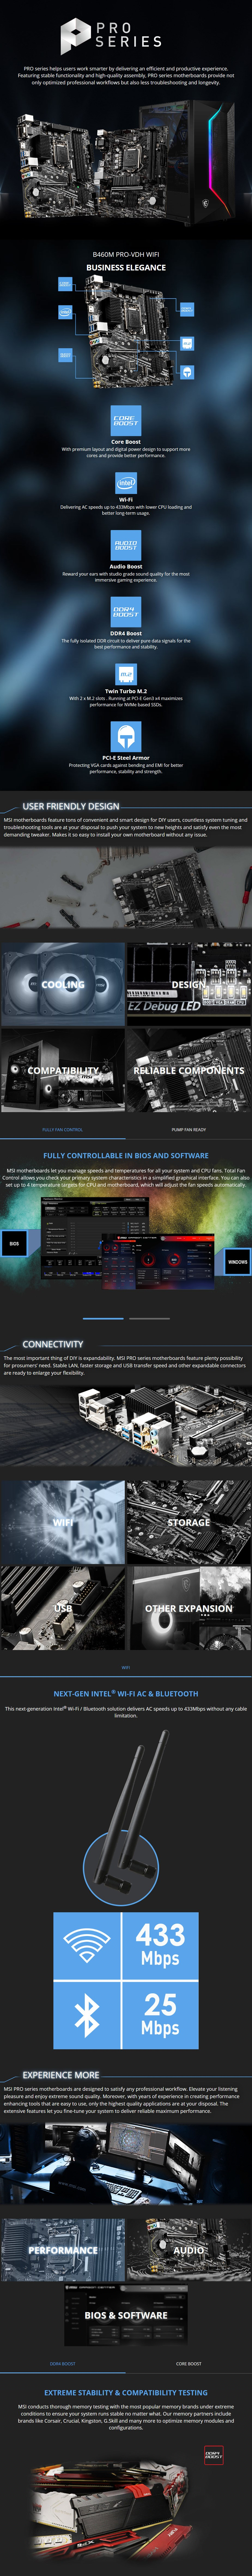 MSI B460M PRO-VDH WIFI LGA 1200 Micro-ATX Motherboard - Overview 1